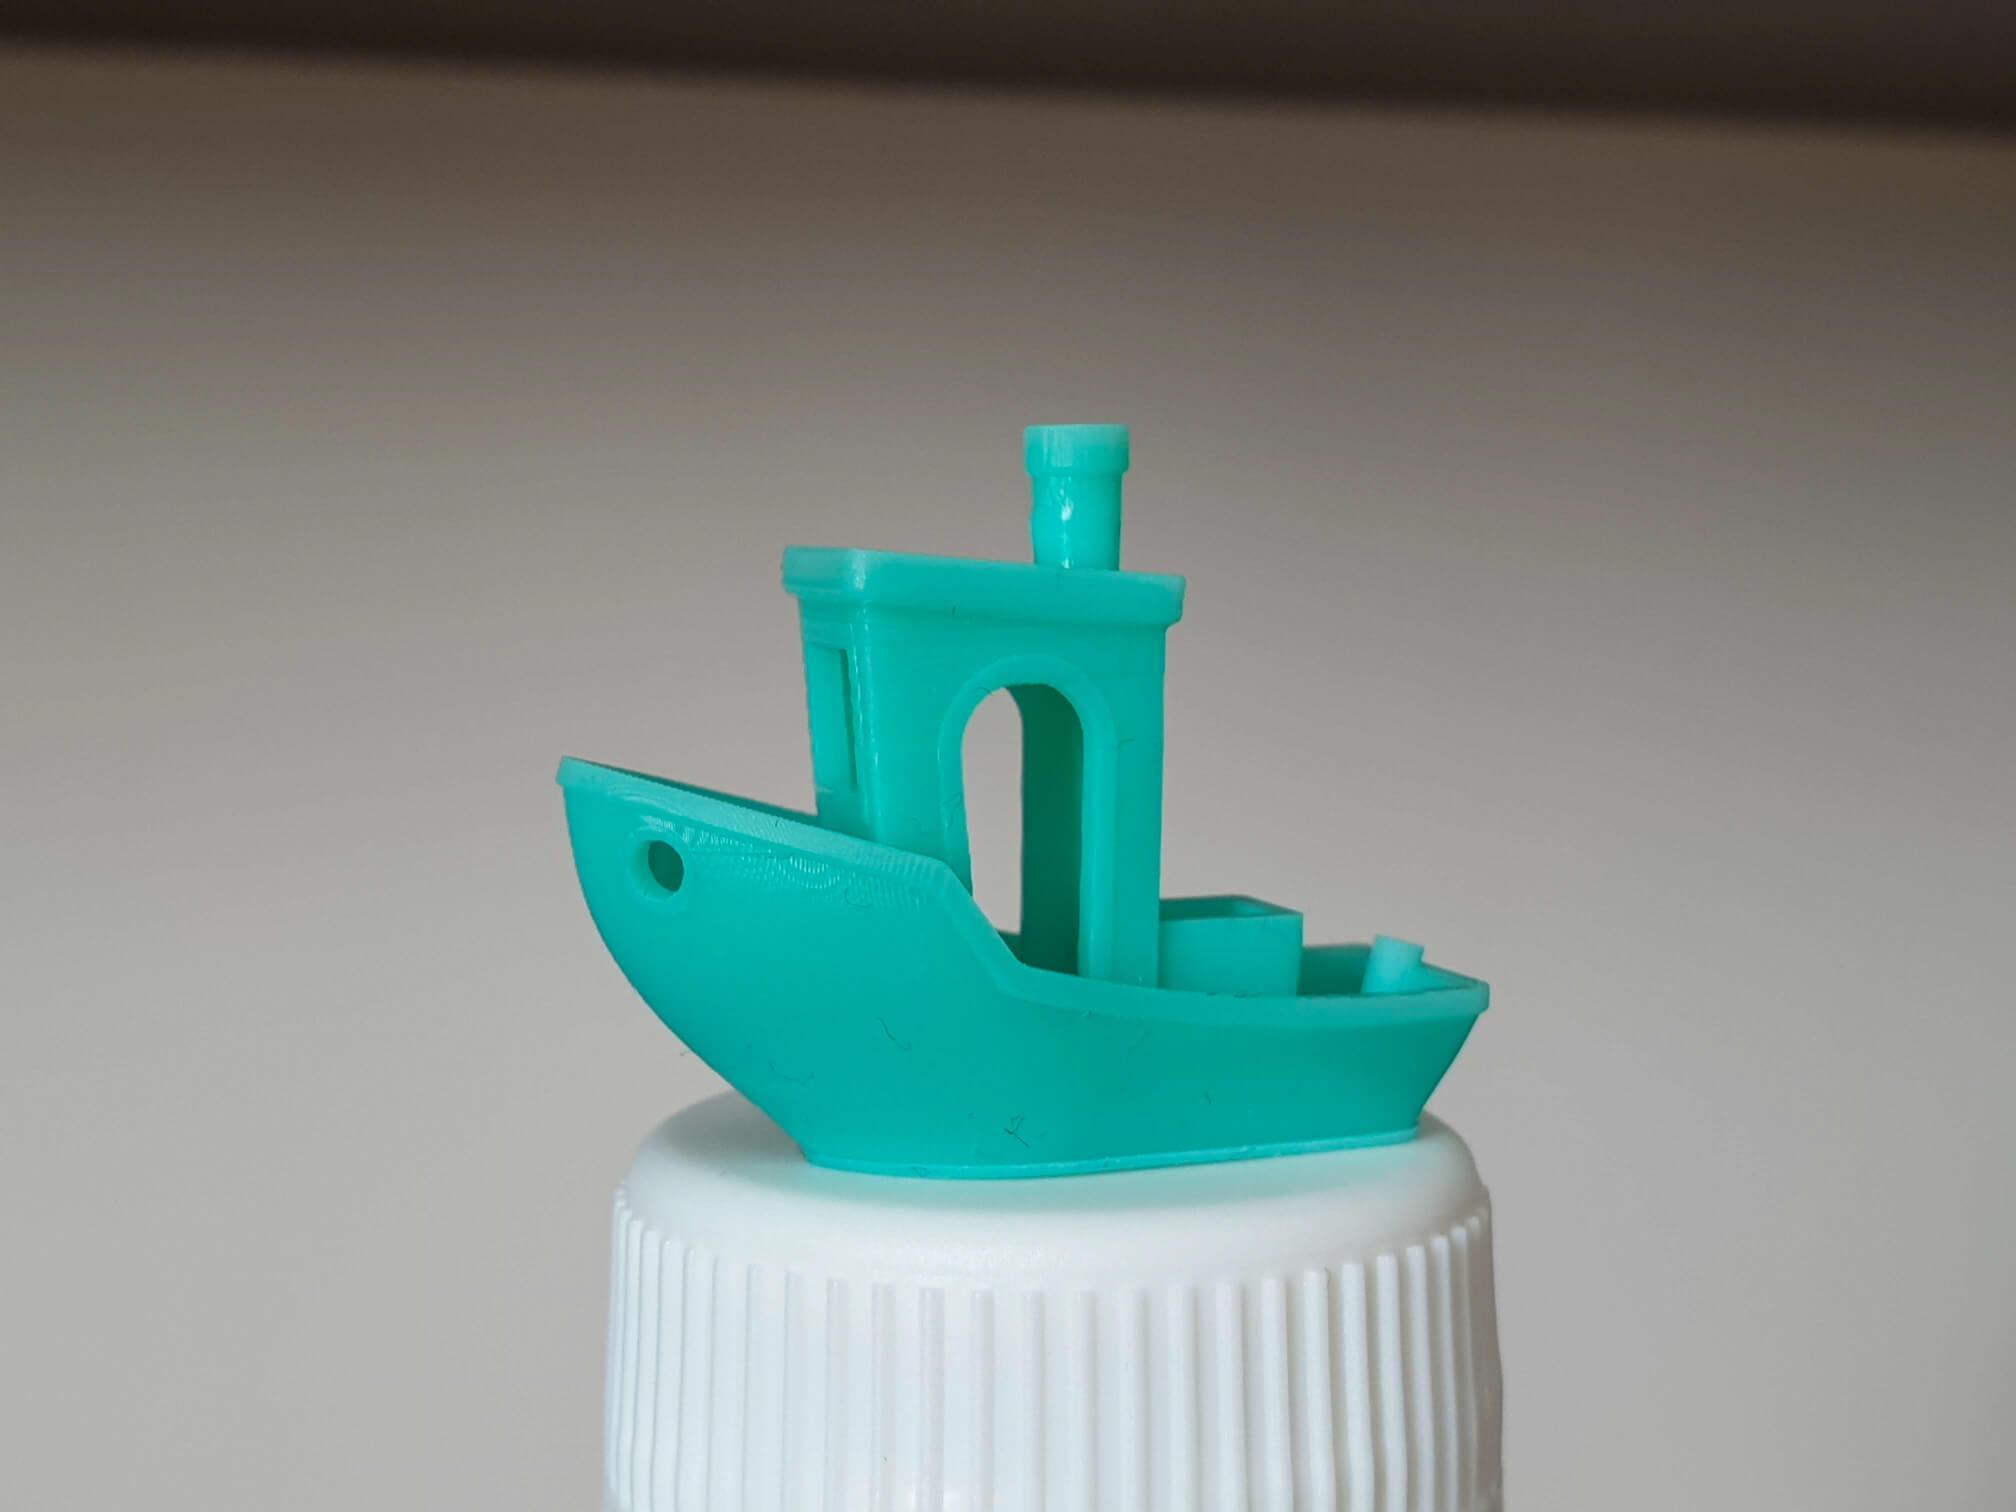 onic Mini review - 3D Benchy